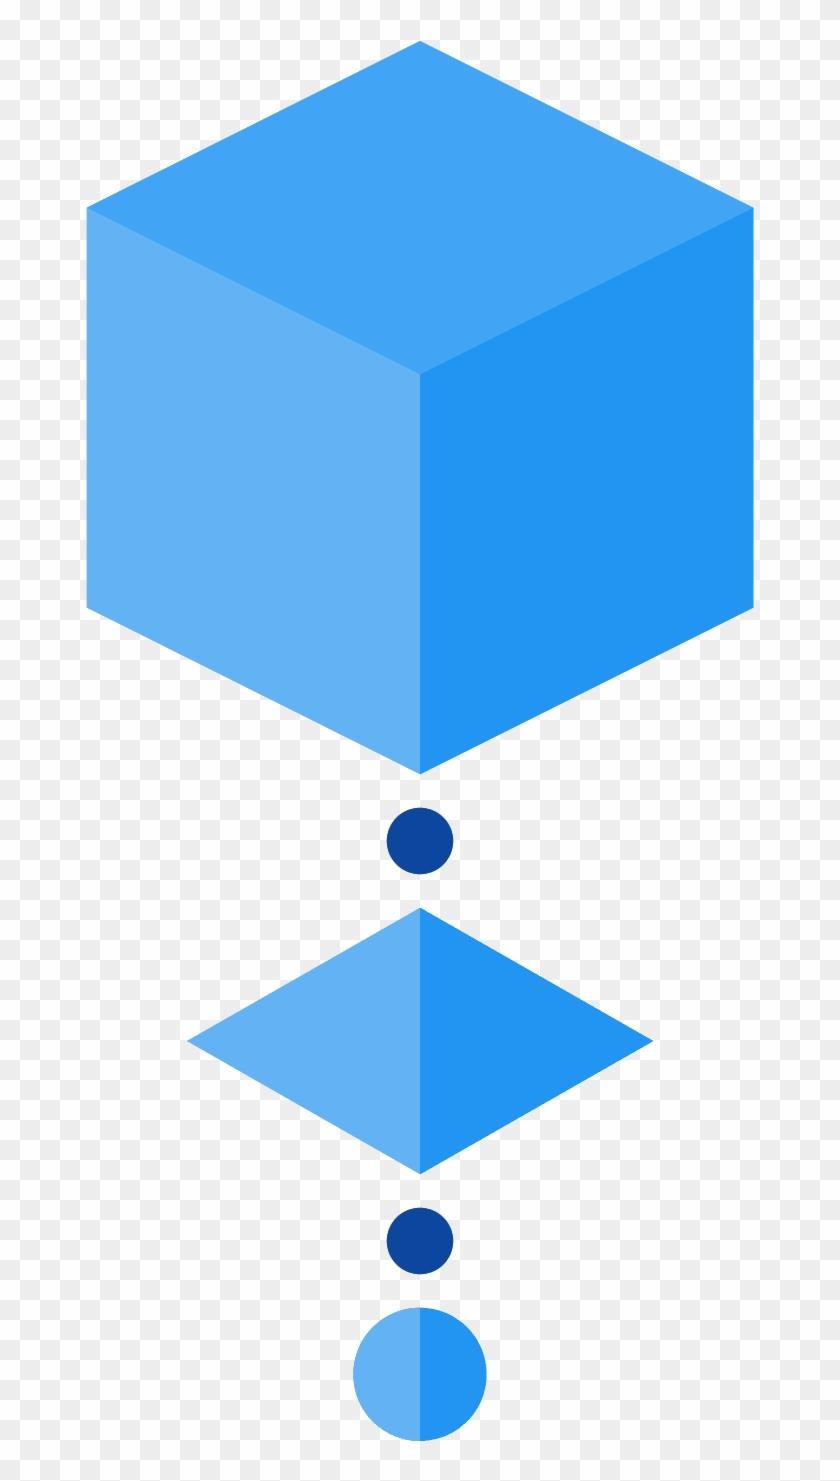 Pokemon Go Pokestop Png - Pokestop Icon, Transparent Png